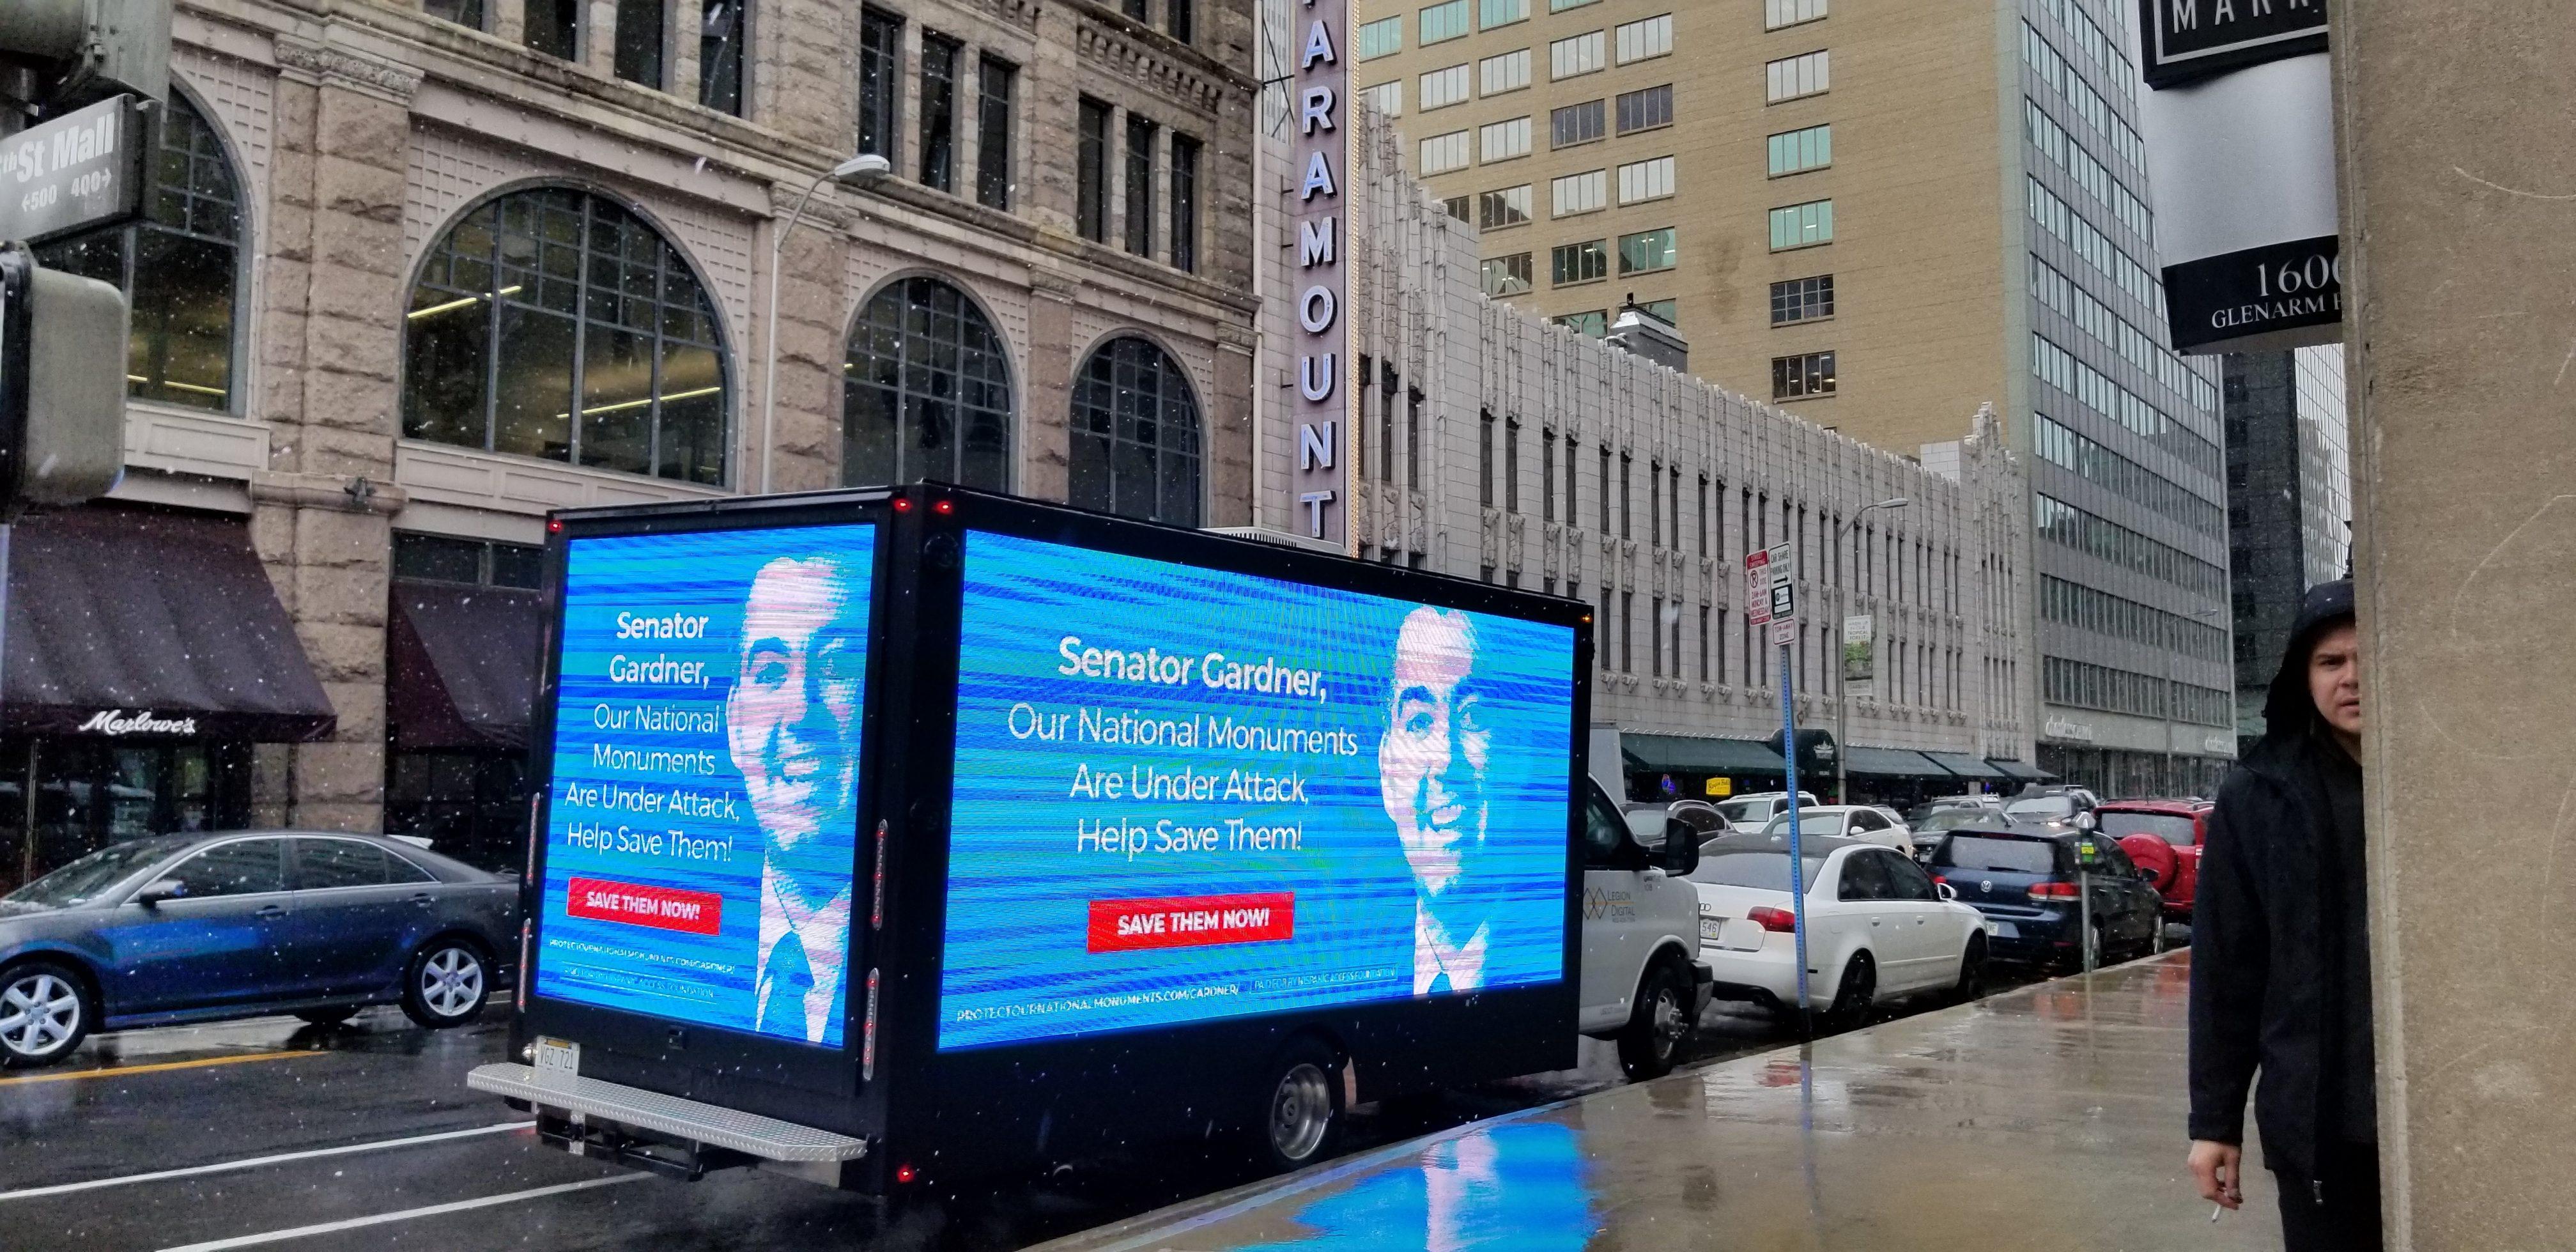 Fuse Box Mobile 2017 Gmc Savana P6 Led Billboard Truck Led Mobile